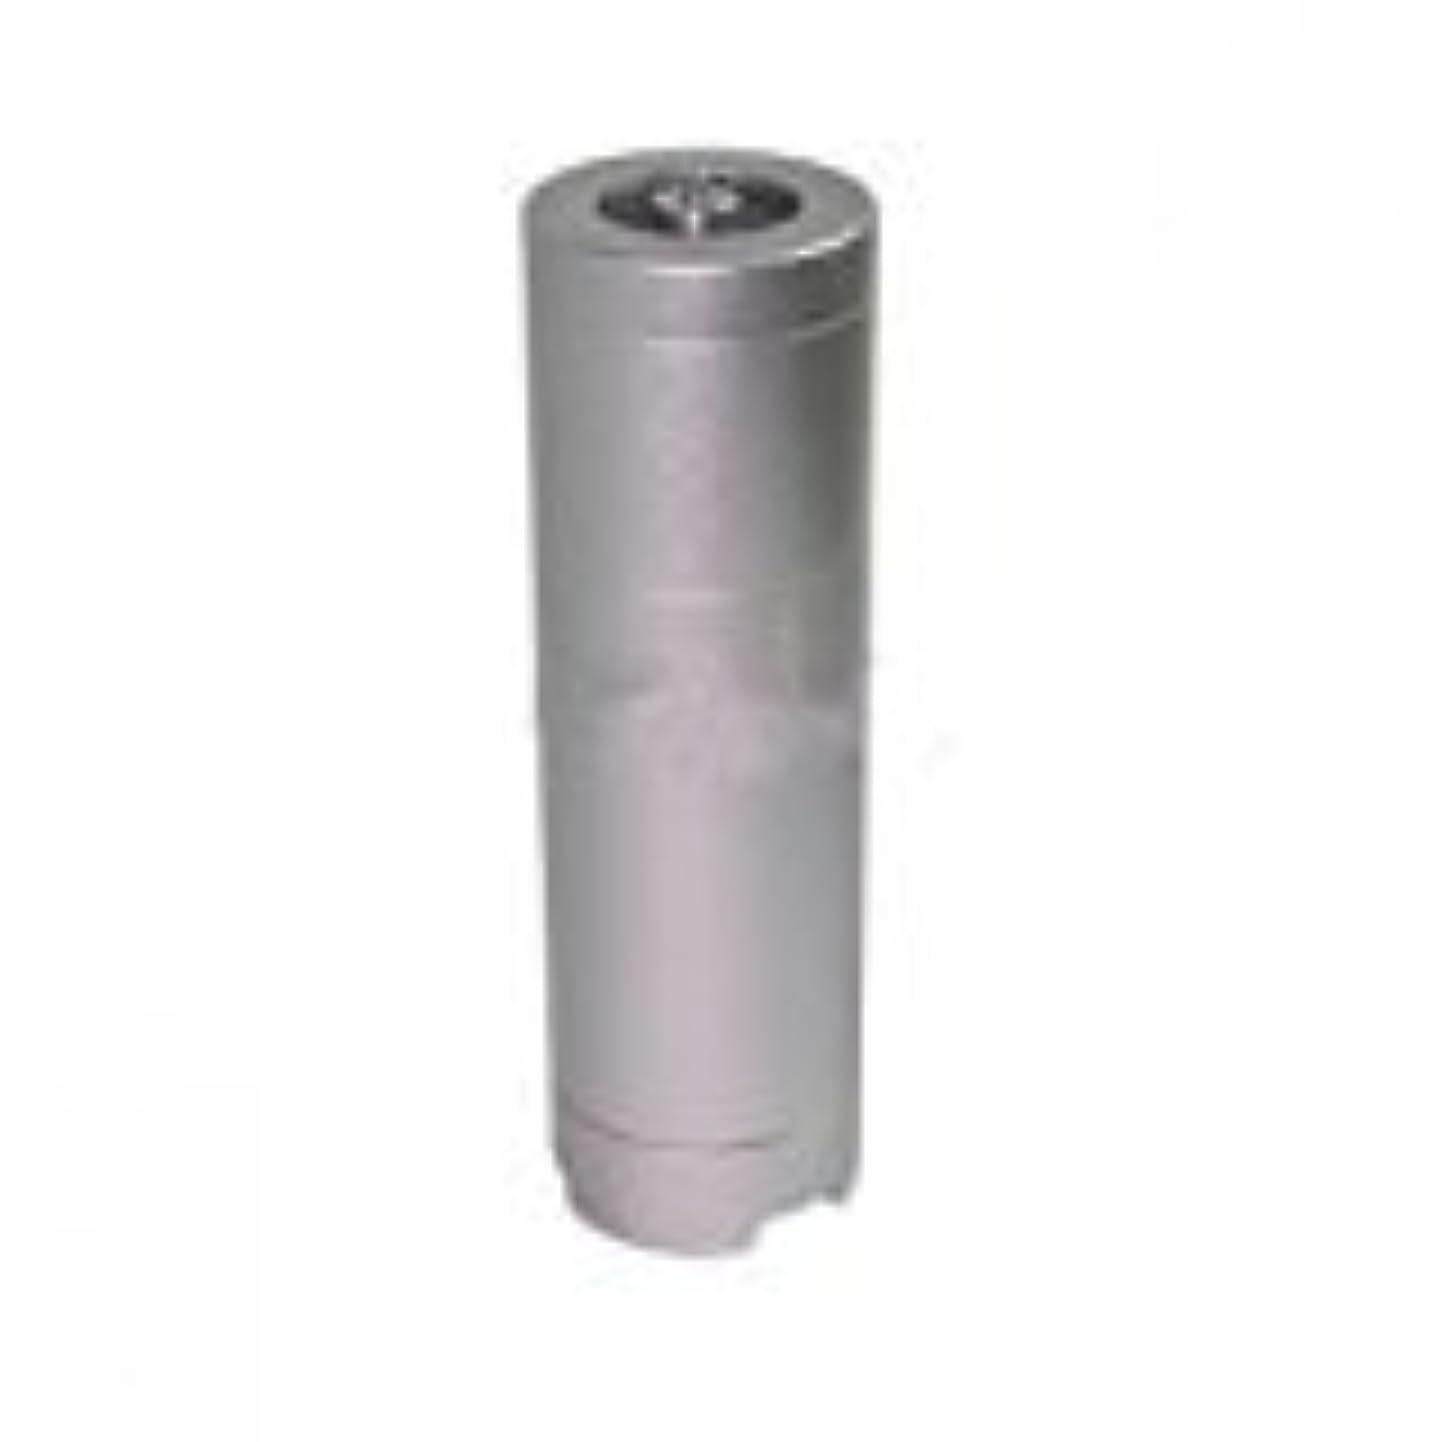 GAOTek Vibration Calibrator with Monitoring System (CE Compliant) siyfxsxwvdo7